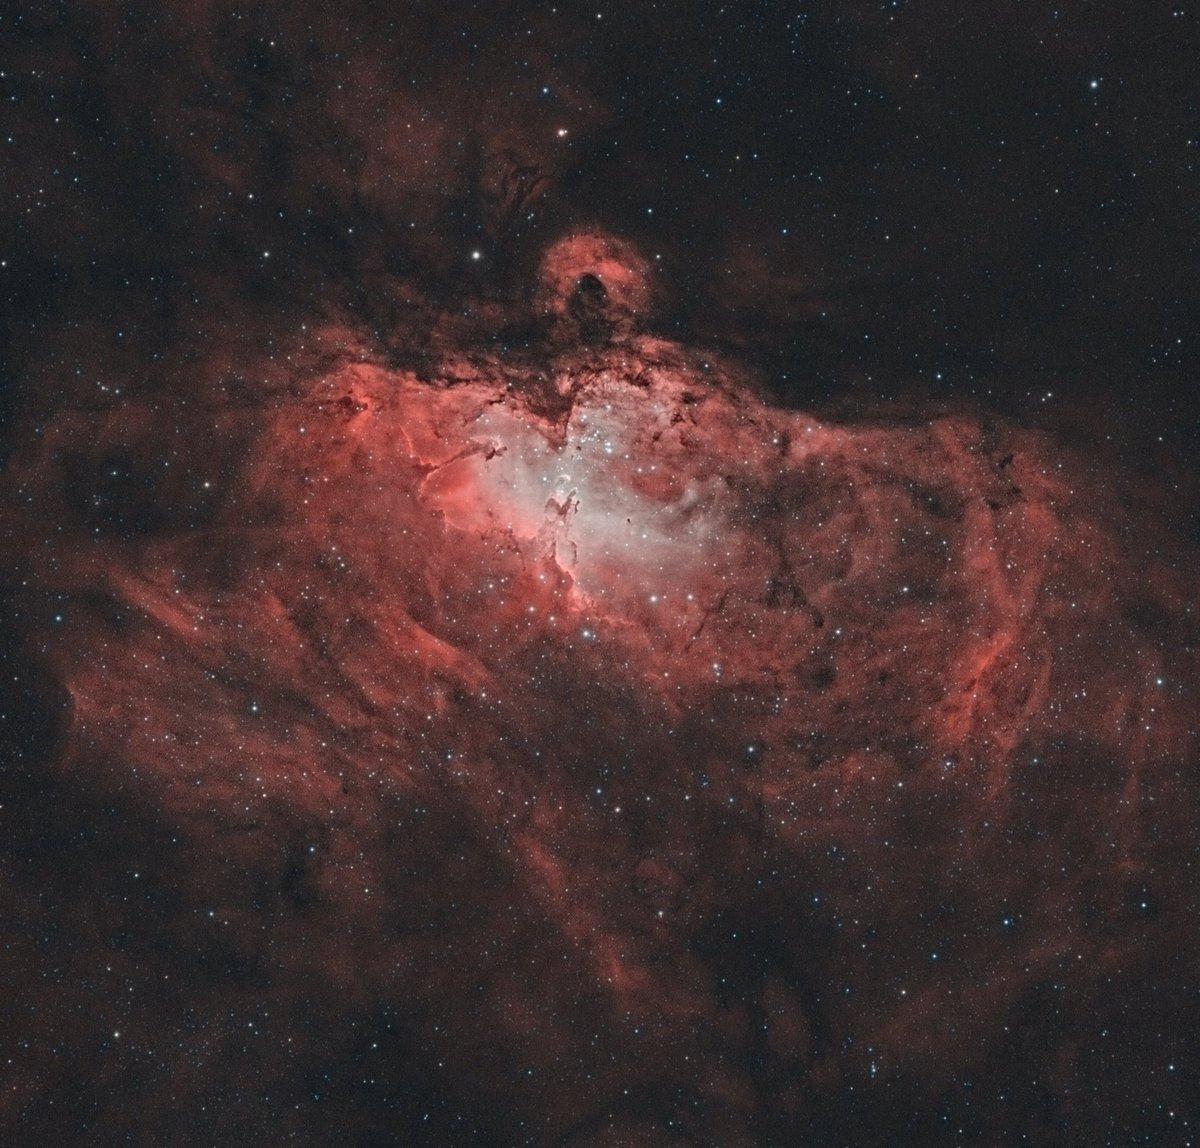 The Eagle Nebula (bicolor) Subs:  Ha: 19x180sec OIII: 27x180sec Telescope: SkyWatcher ED80/600+0.85x reducer/flattener Camera: ZWO ASI1600mmc #Astrophotography #bicolor #astronomy #eaglenebula #deepsky #skywatcher #zwoasi #asi1600mm #telescope #ed80 #amateurphotography #Slovakia https://t.co/WnzZm9p52s